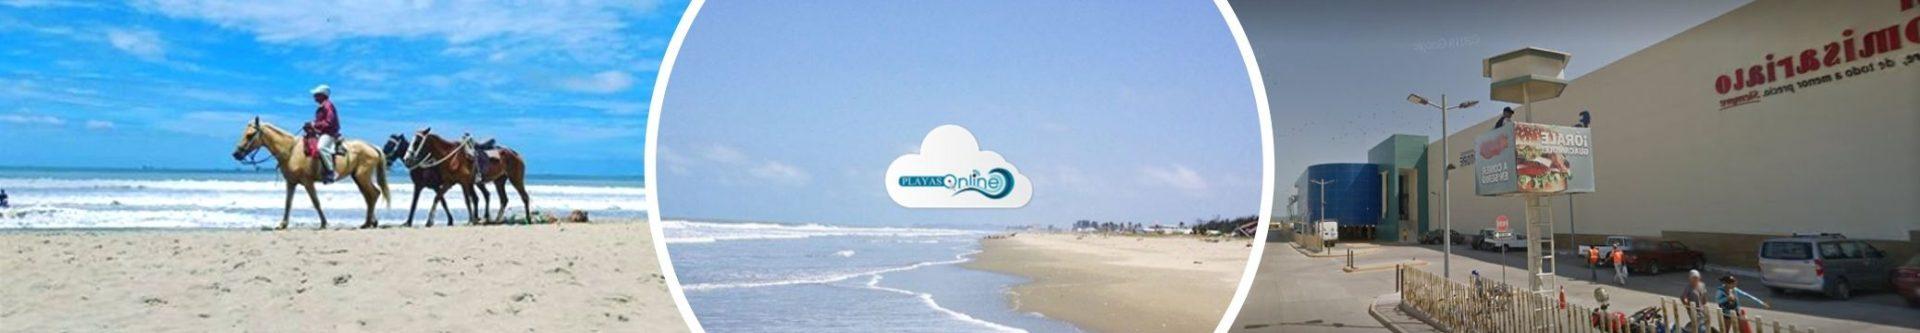 Playas en la Vía Data Villamil Posorja